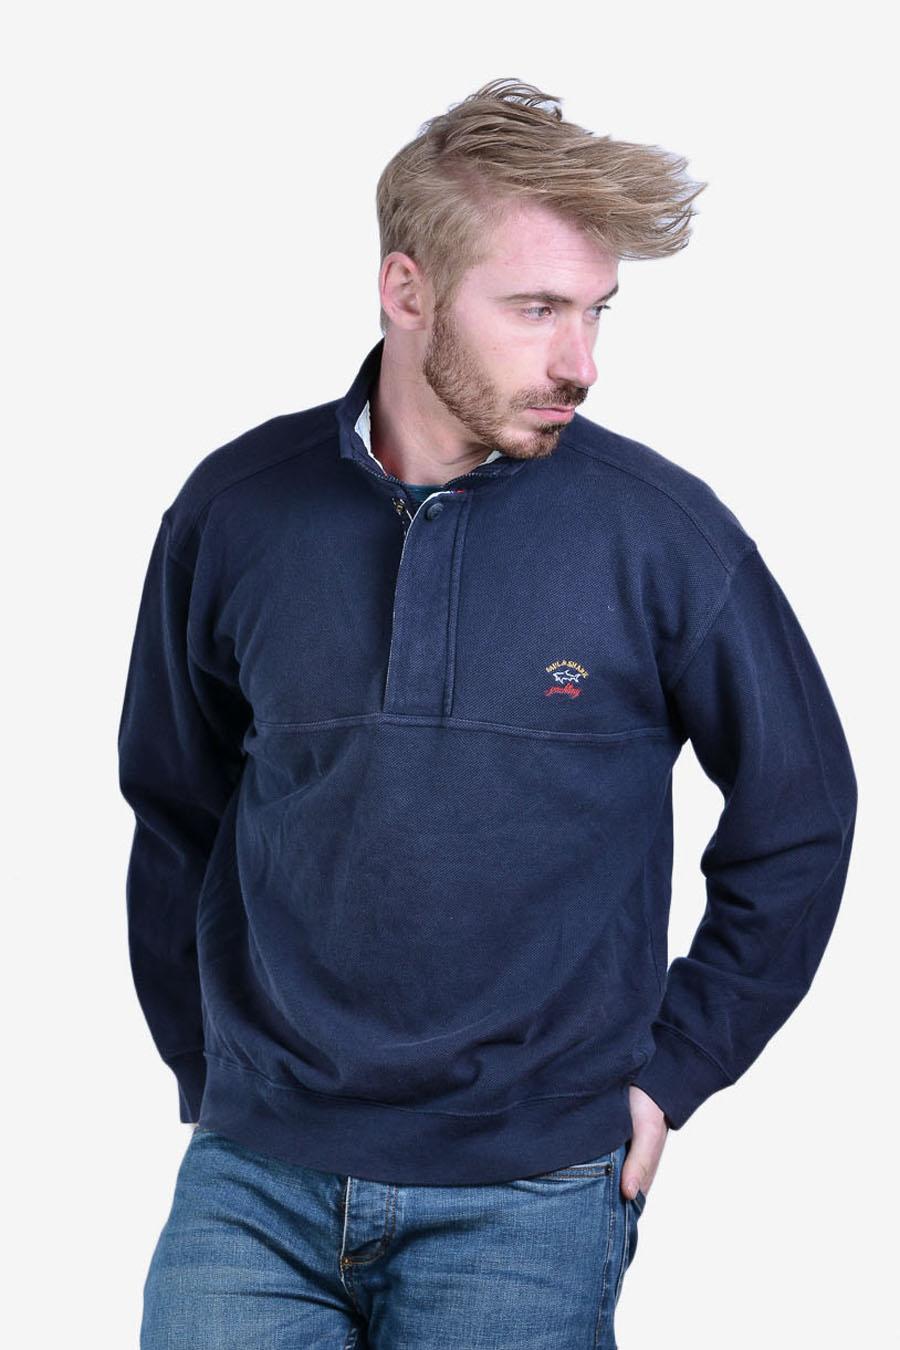 Vintage Paul & Shark Yachting sweatshirt